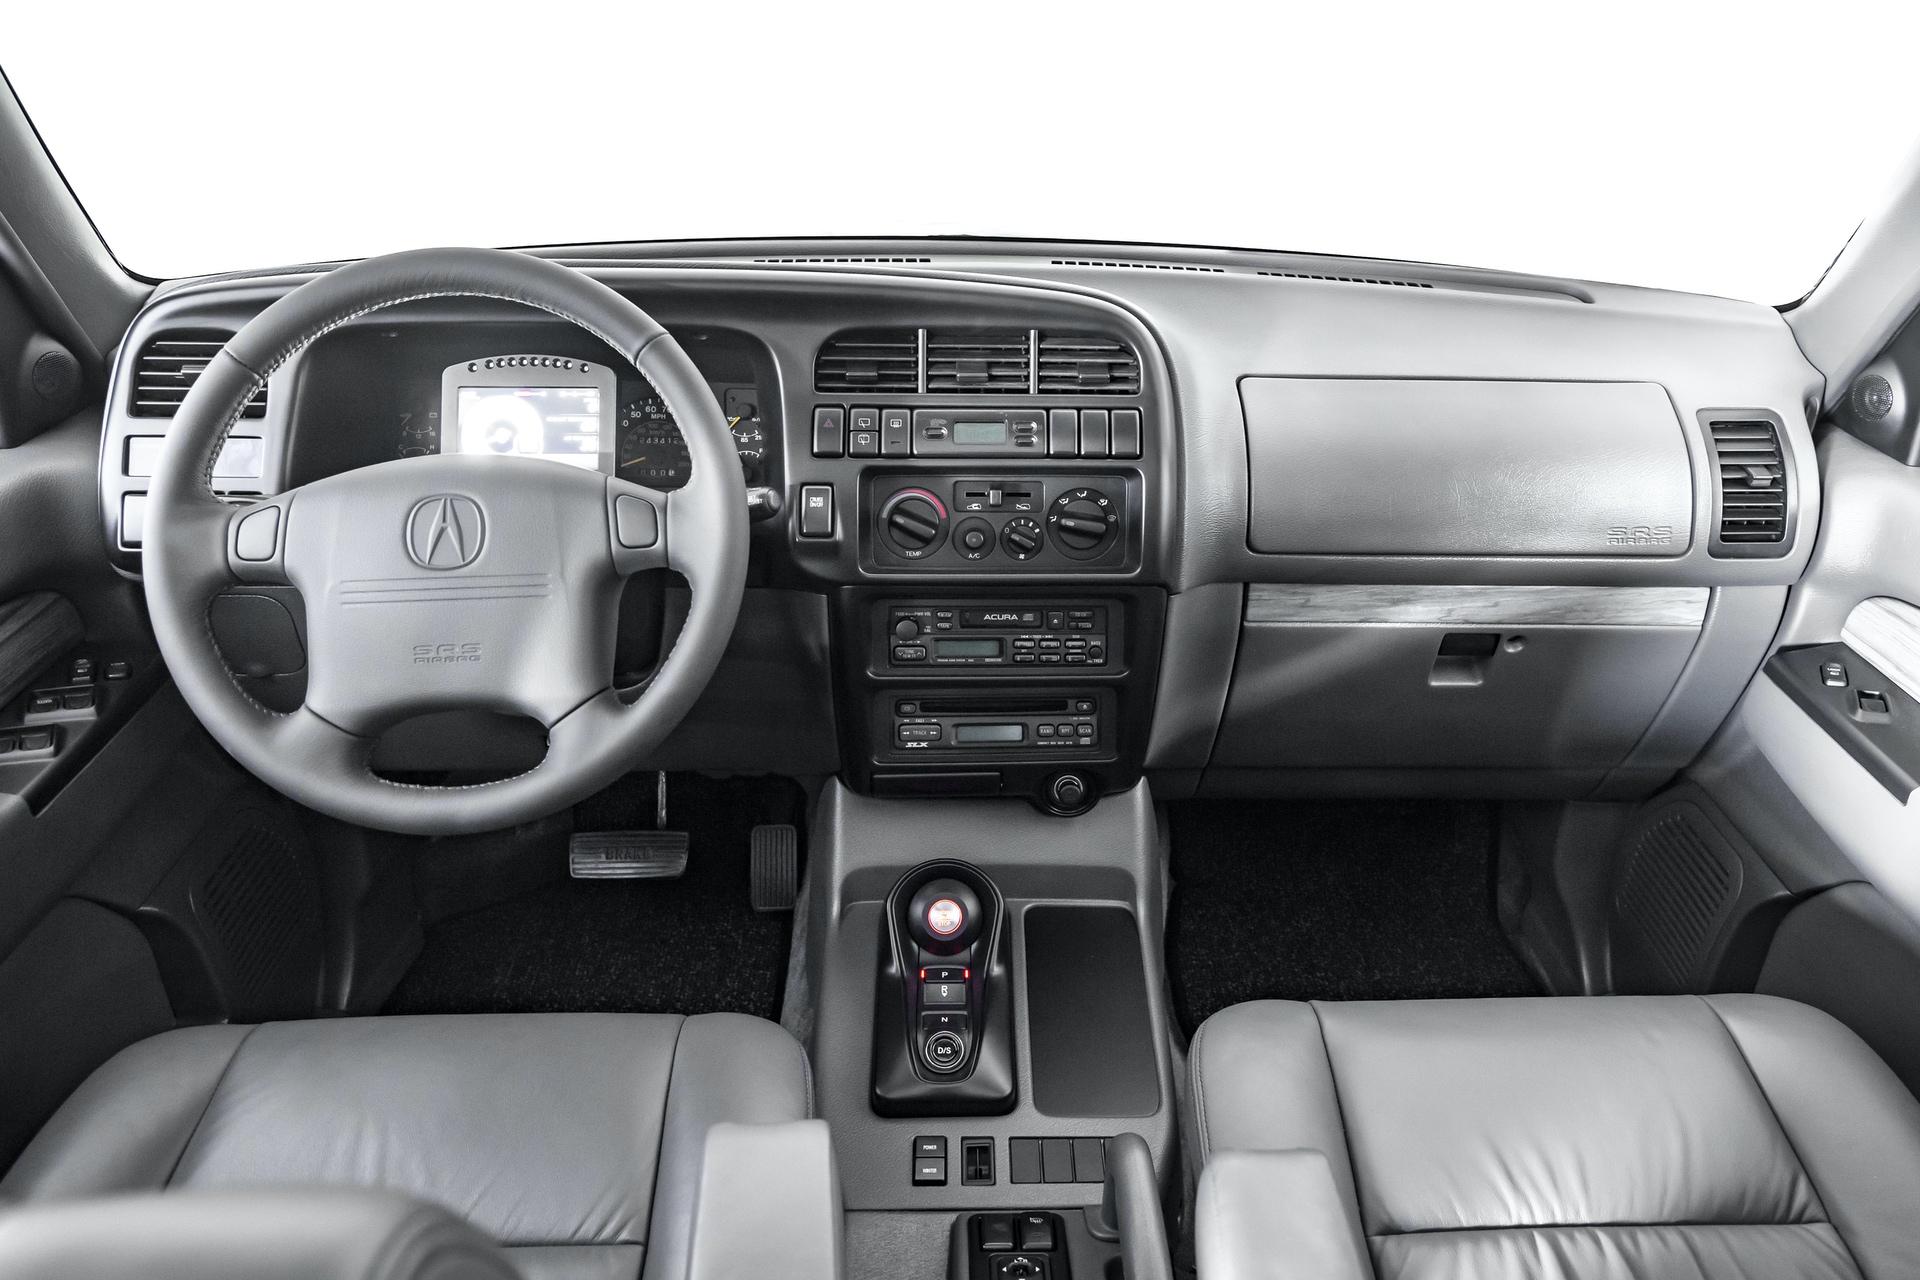 Acura-SH-SLX_017